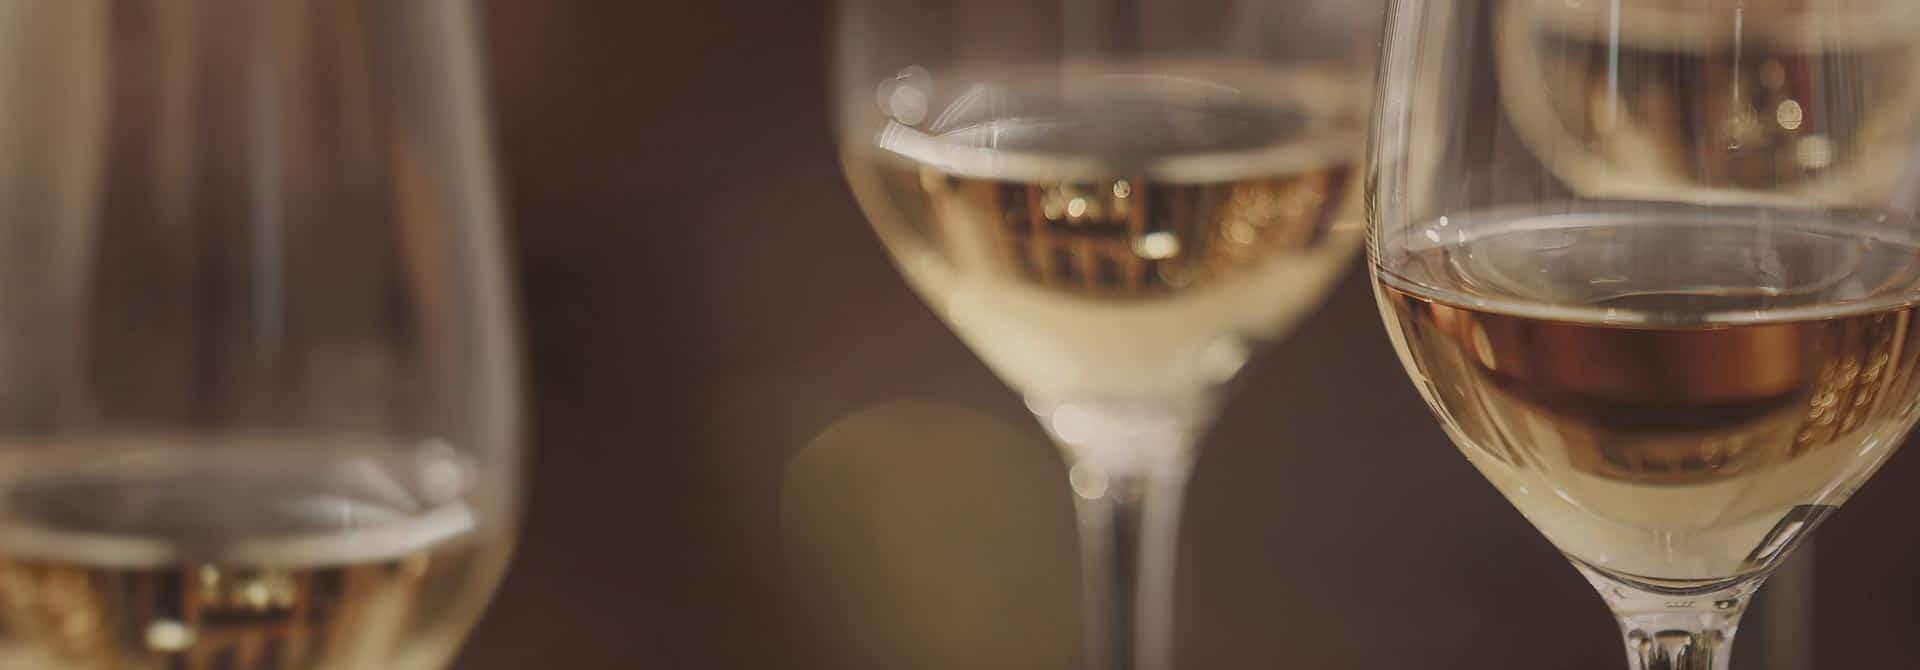 Honey Wine Tasting - Campbell's Gold